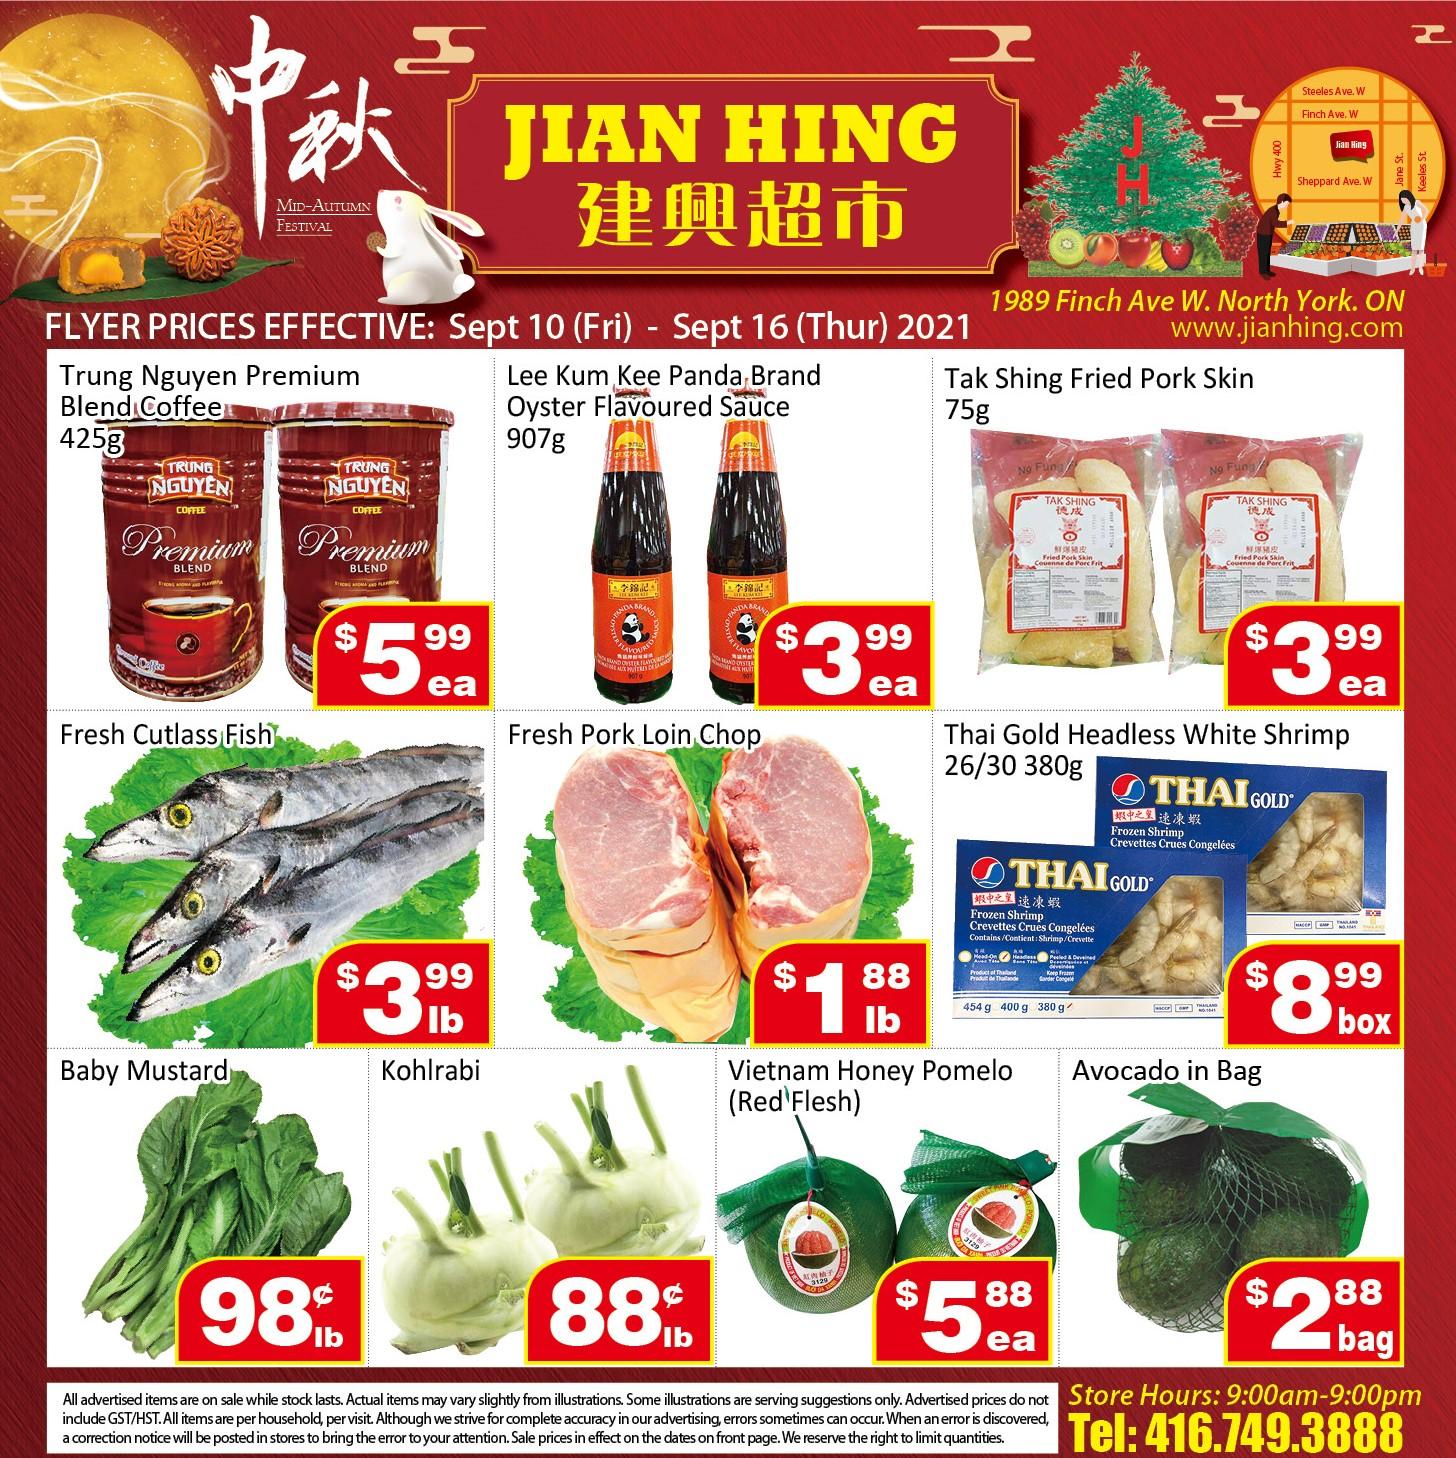 Jian Hing Supermarket Northyork Flyer | Sep 10